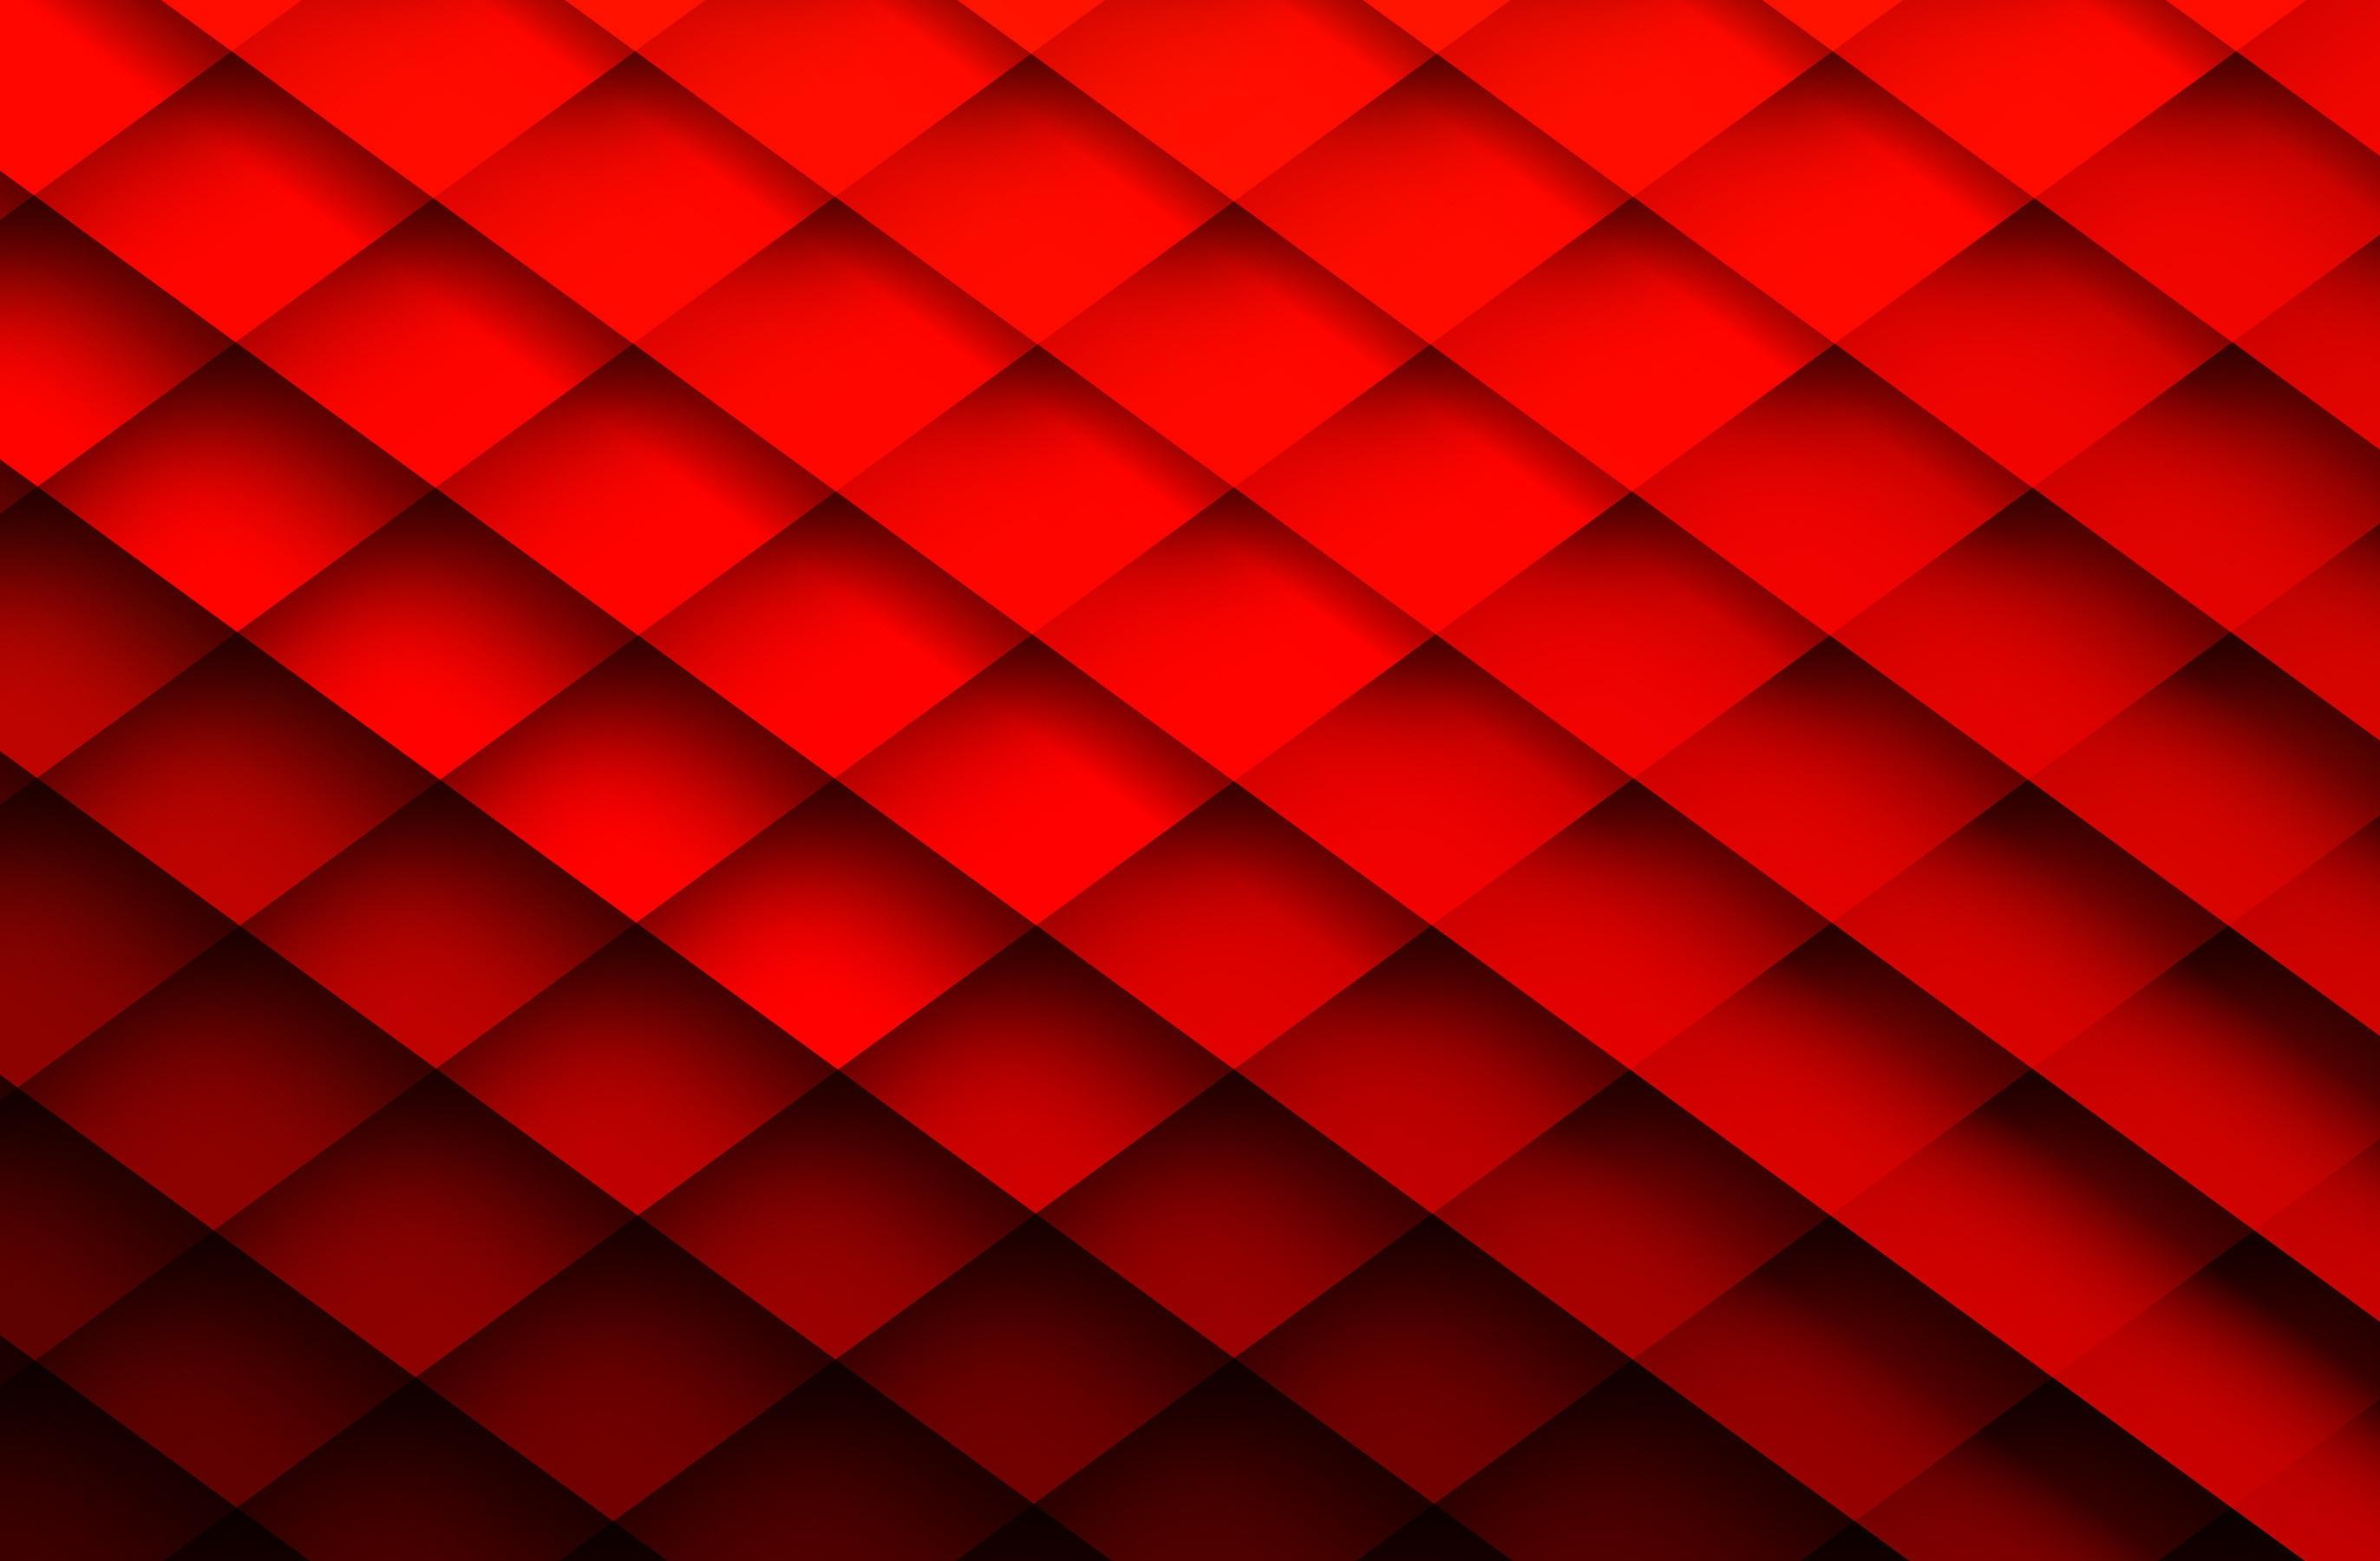 free photo red nature